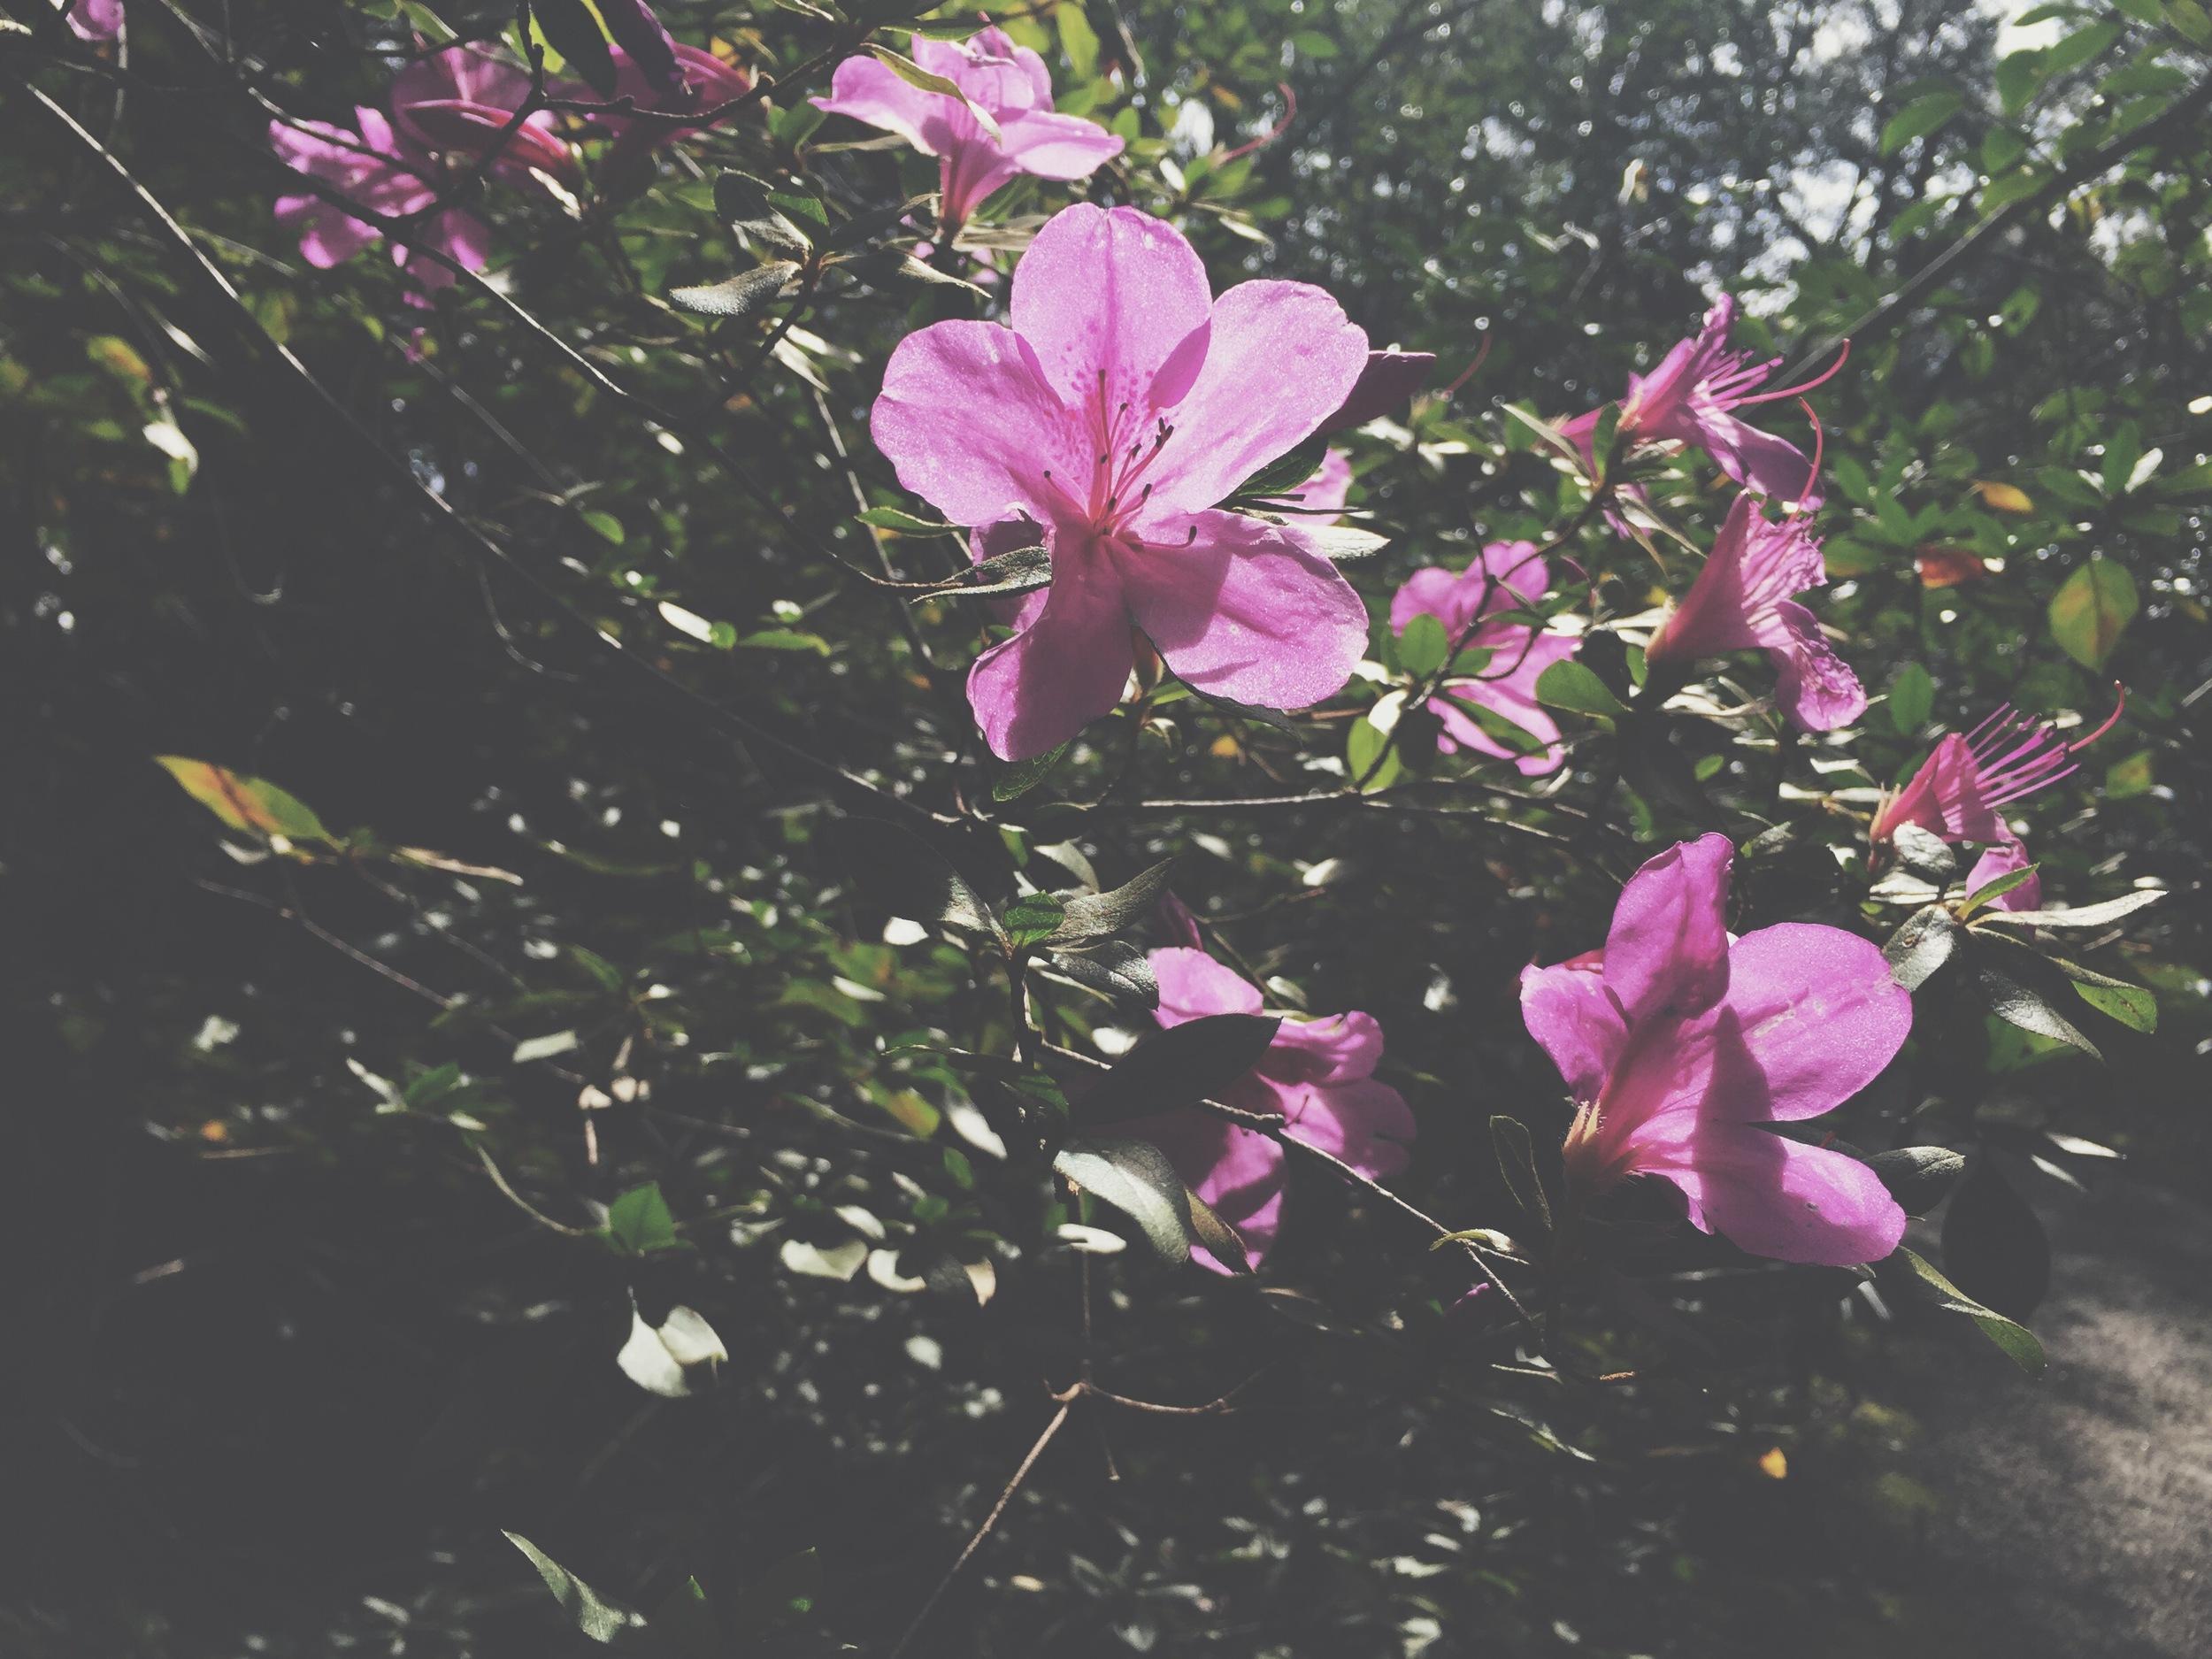 Flowers at Magnolia Plantation